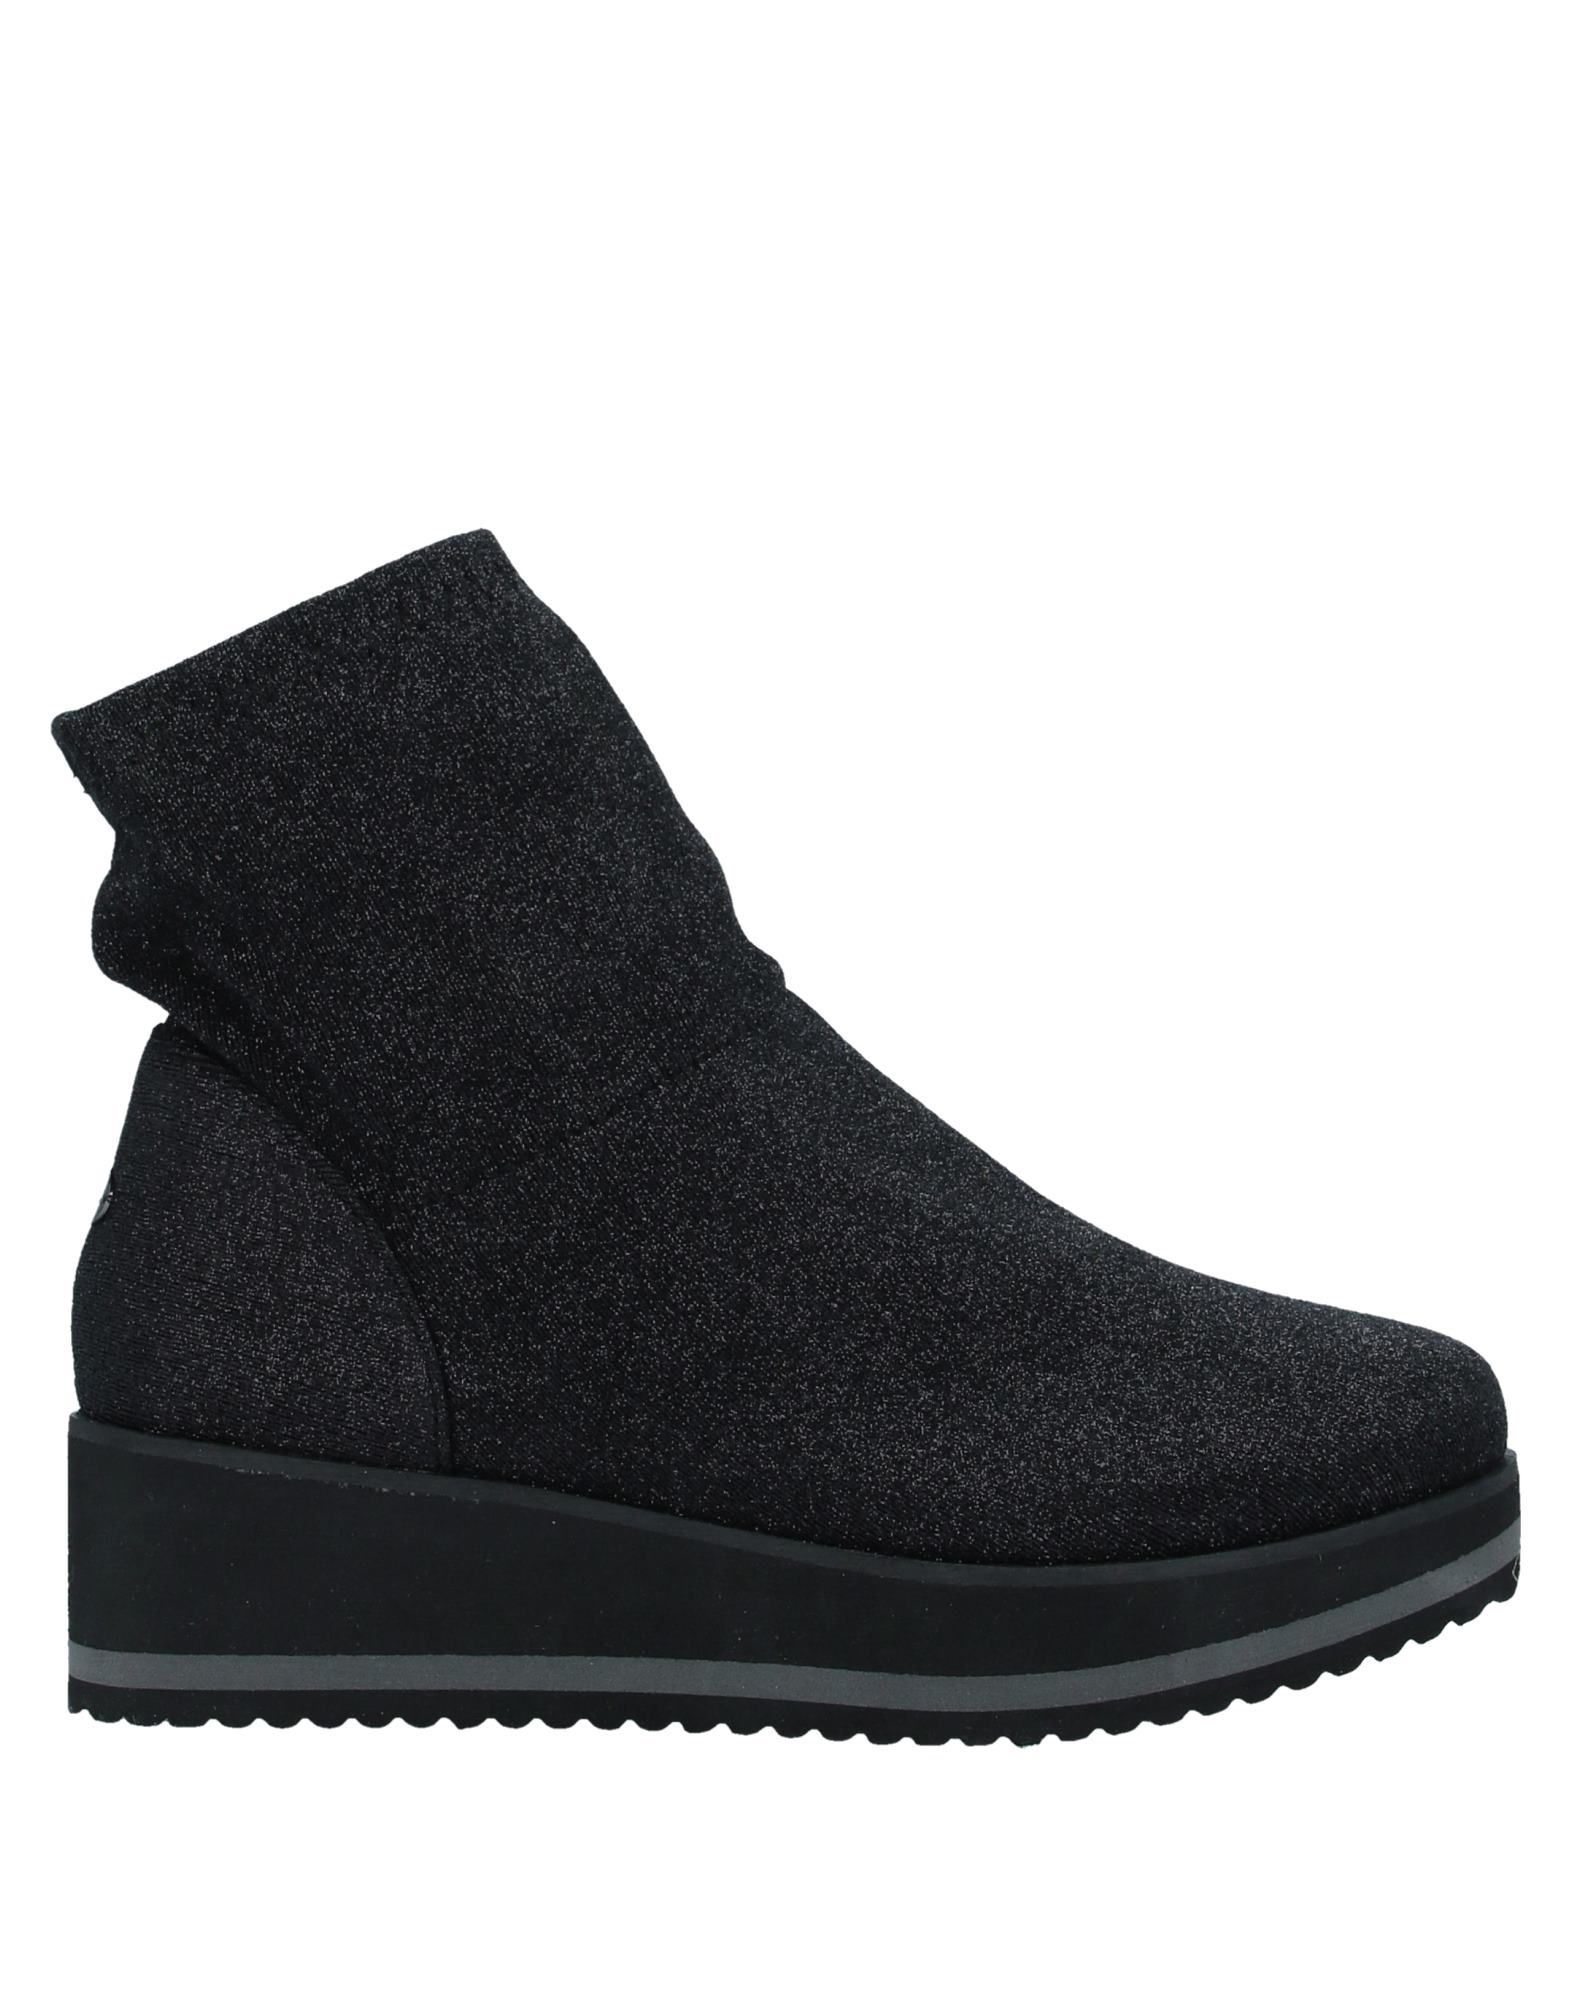 O6 Milano Полусапоги и высокие ботинки o6 milano полусапоги и высокие ботинки